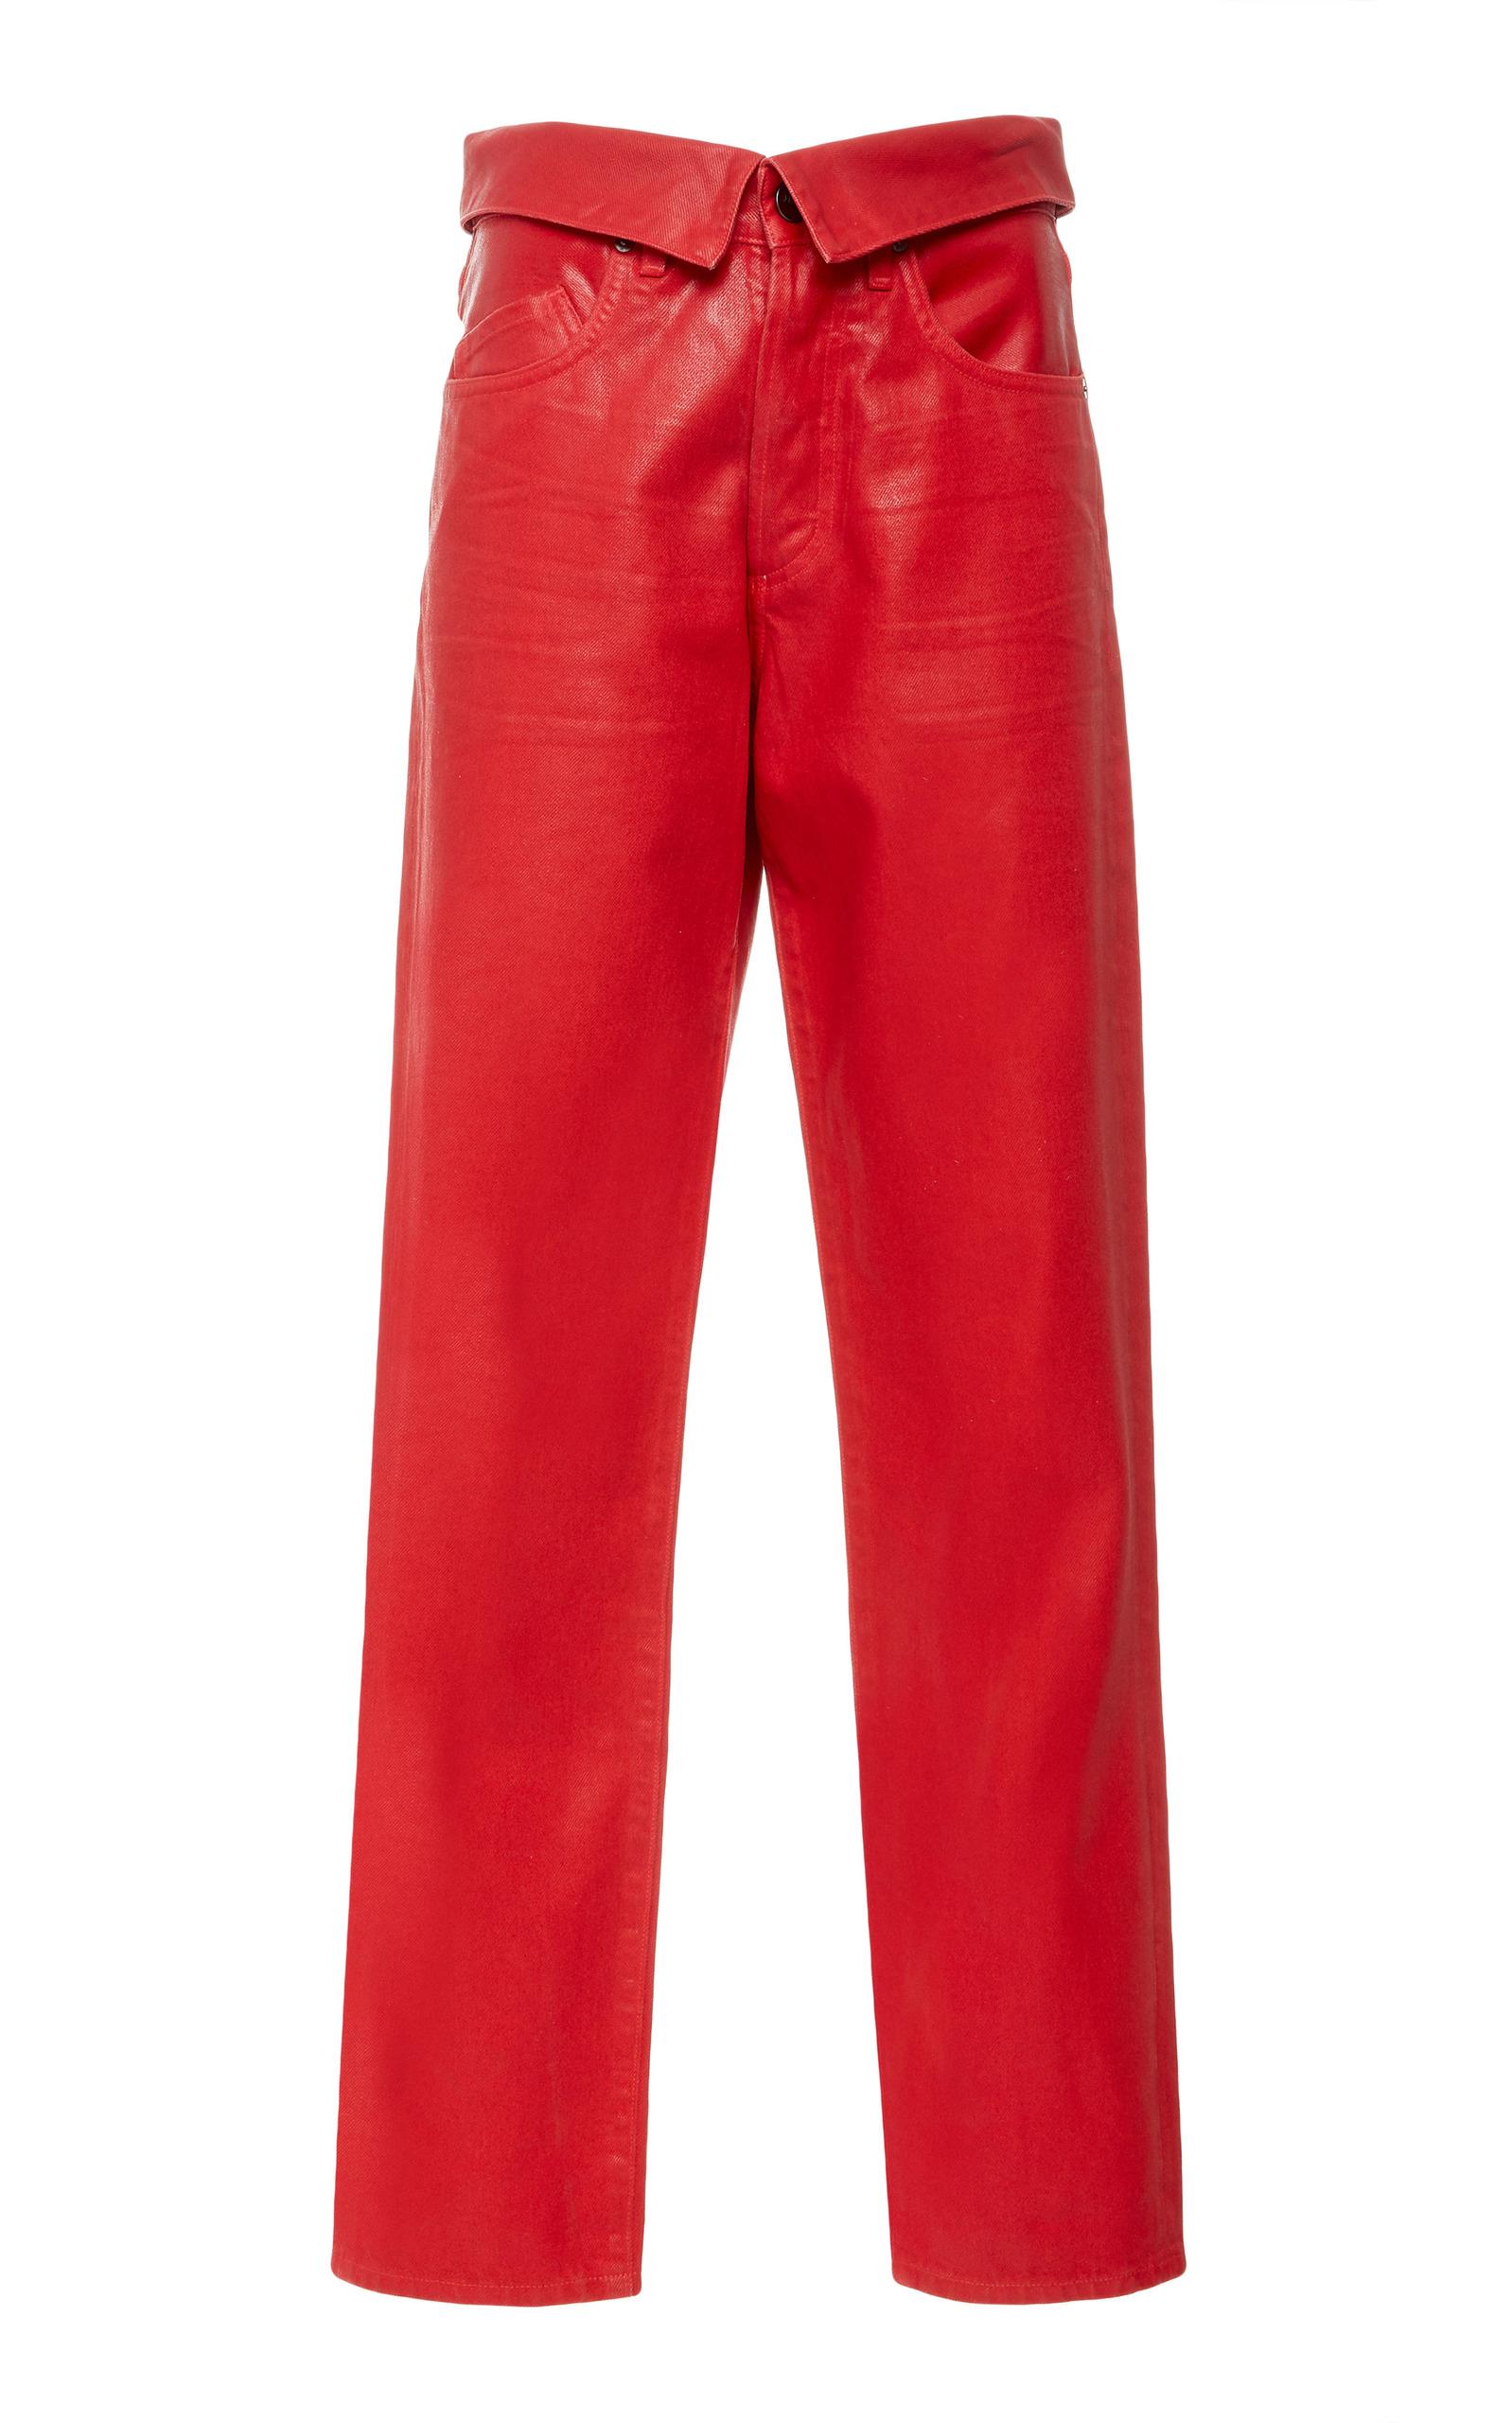 JEAN ATELIER Coated Denim Flip Waist Pant in Rouge